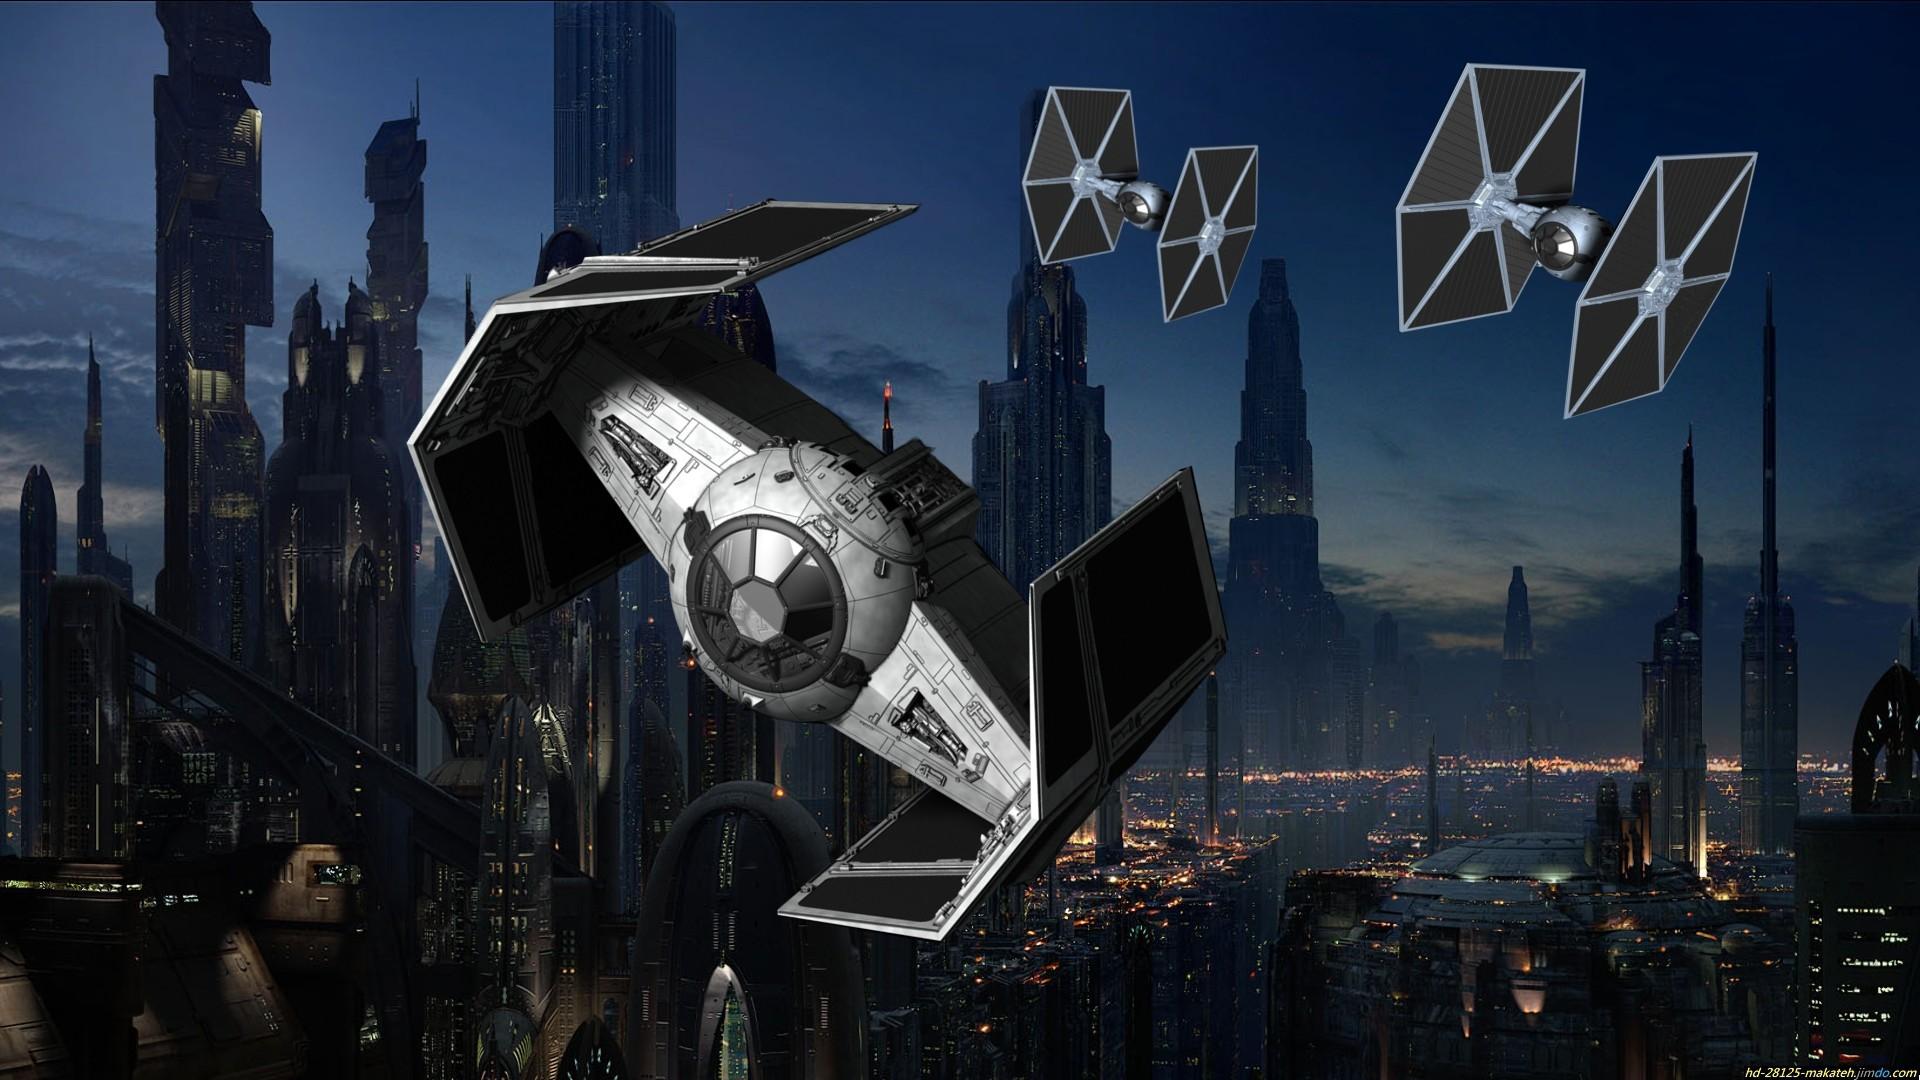 Star Wars Hd Wallpaper 1366x768 70 Images